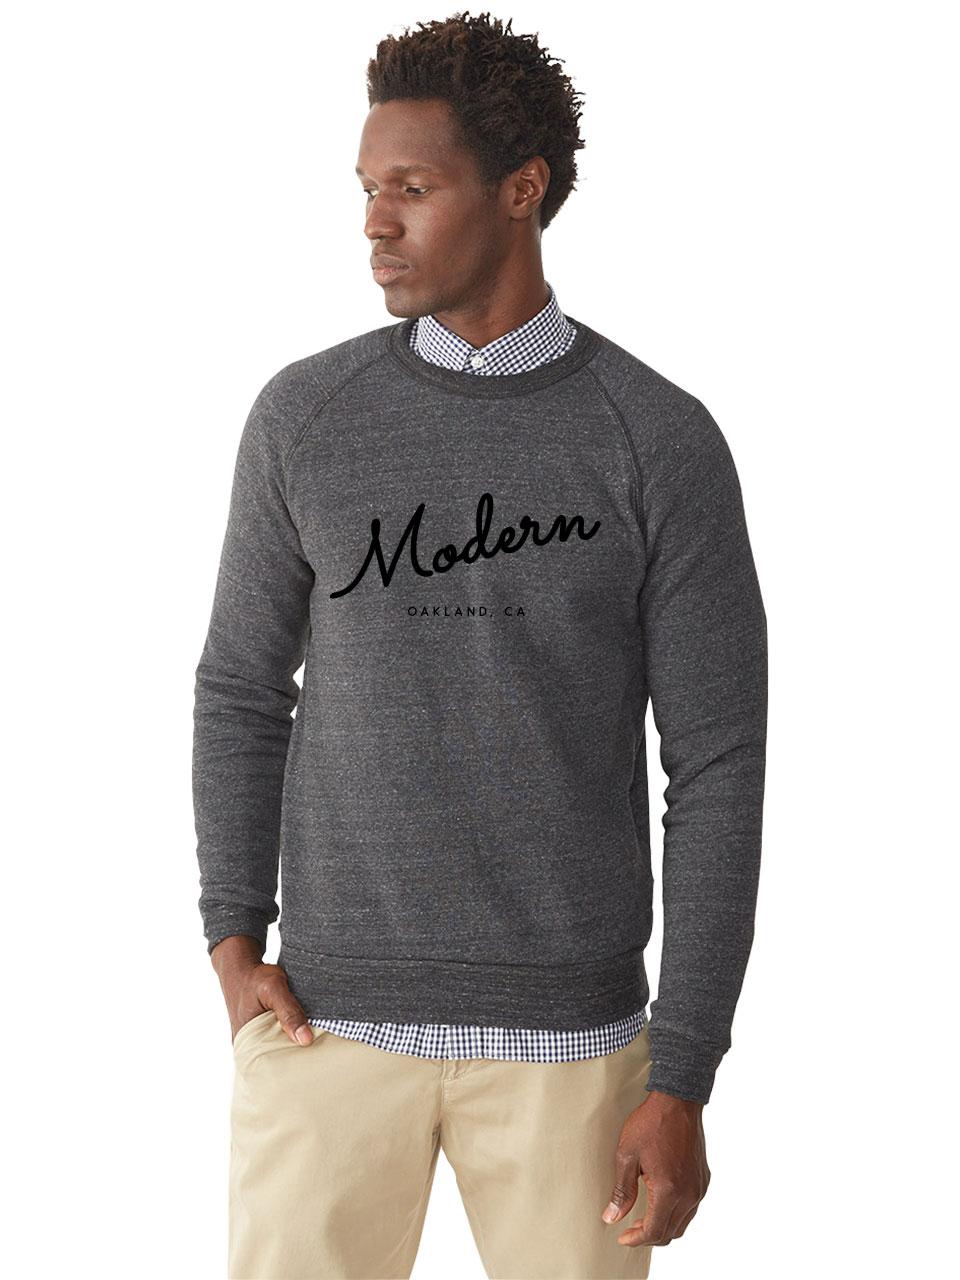 sweatshirt_mockup-R3-C-black